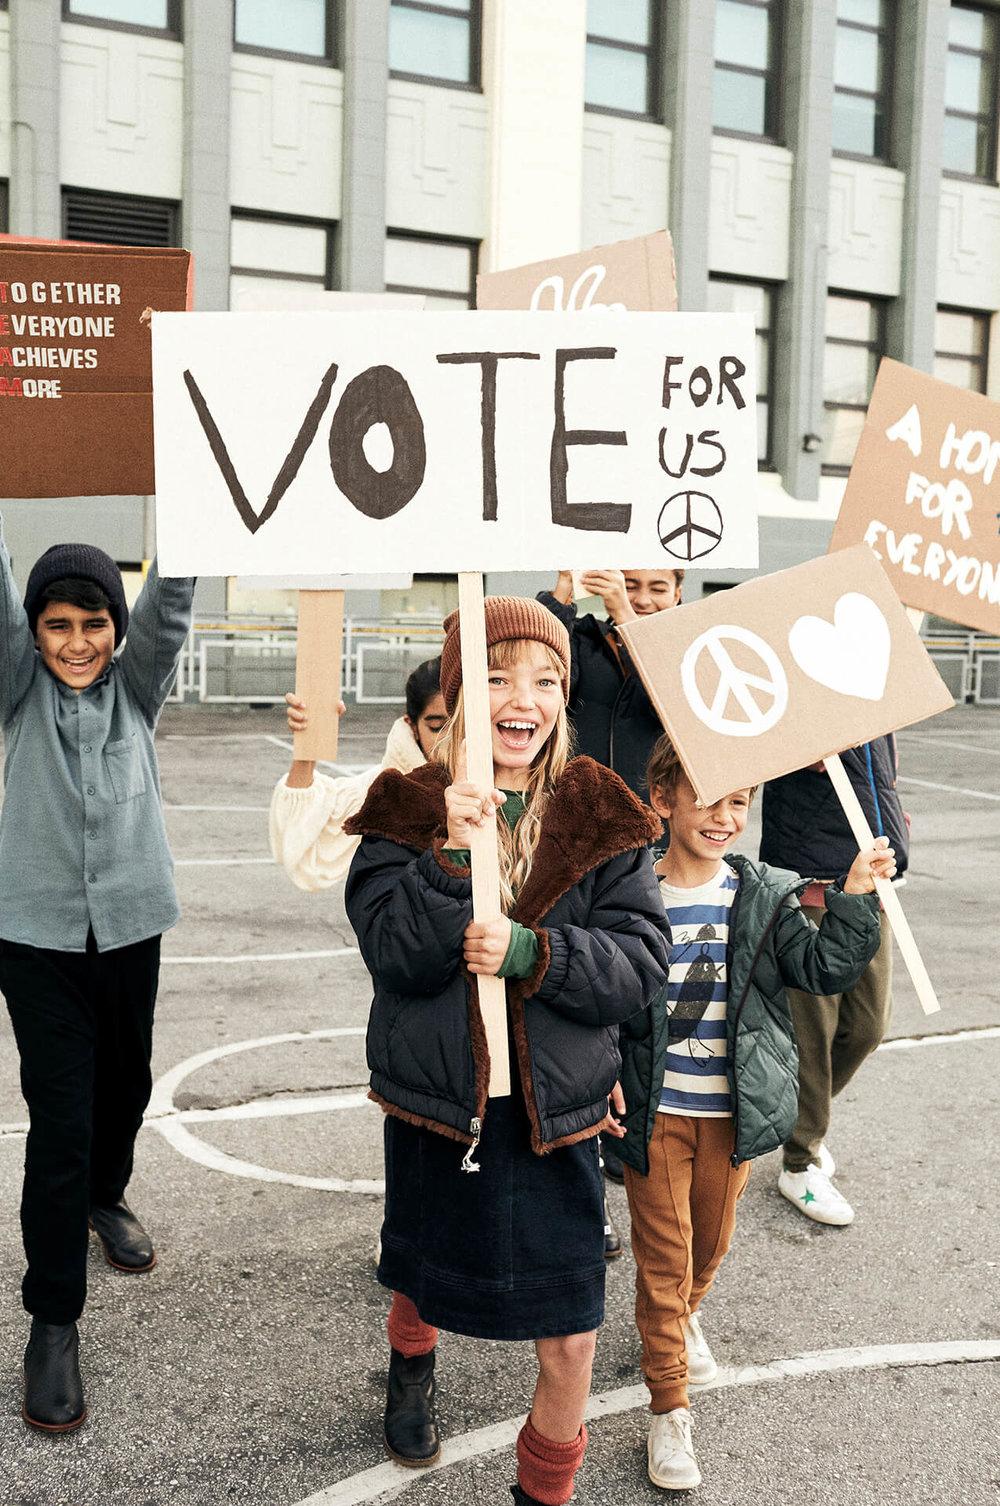 aw18-vote-3.jpg